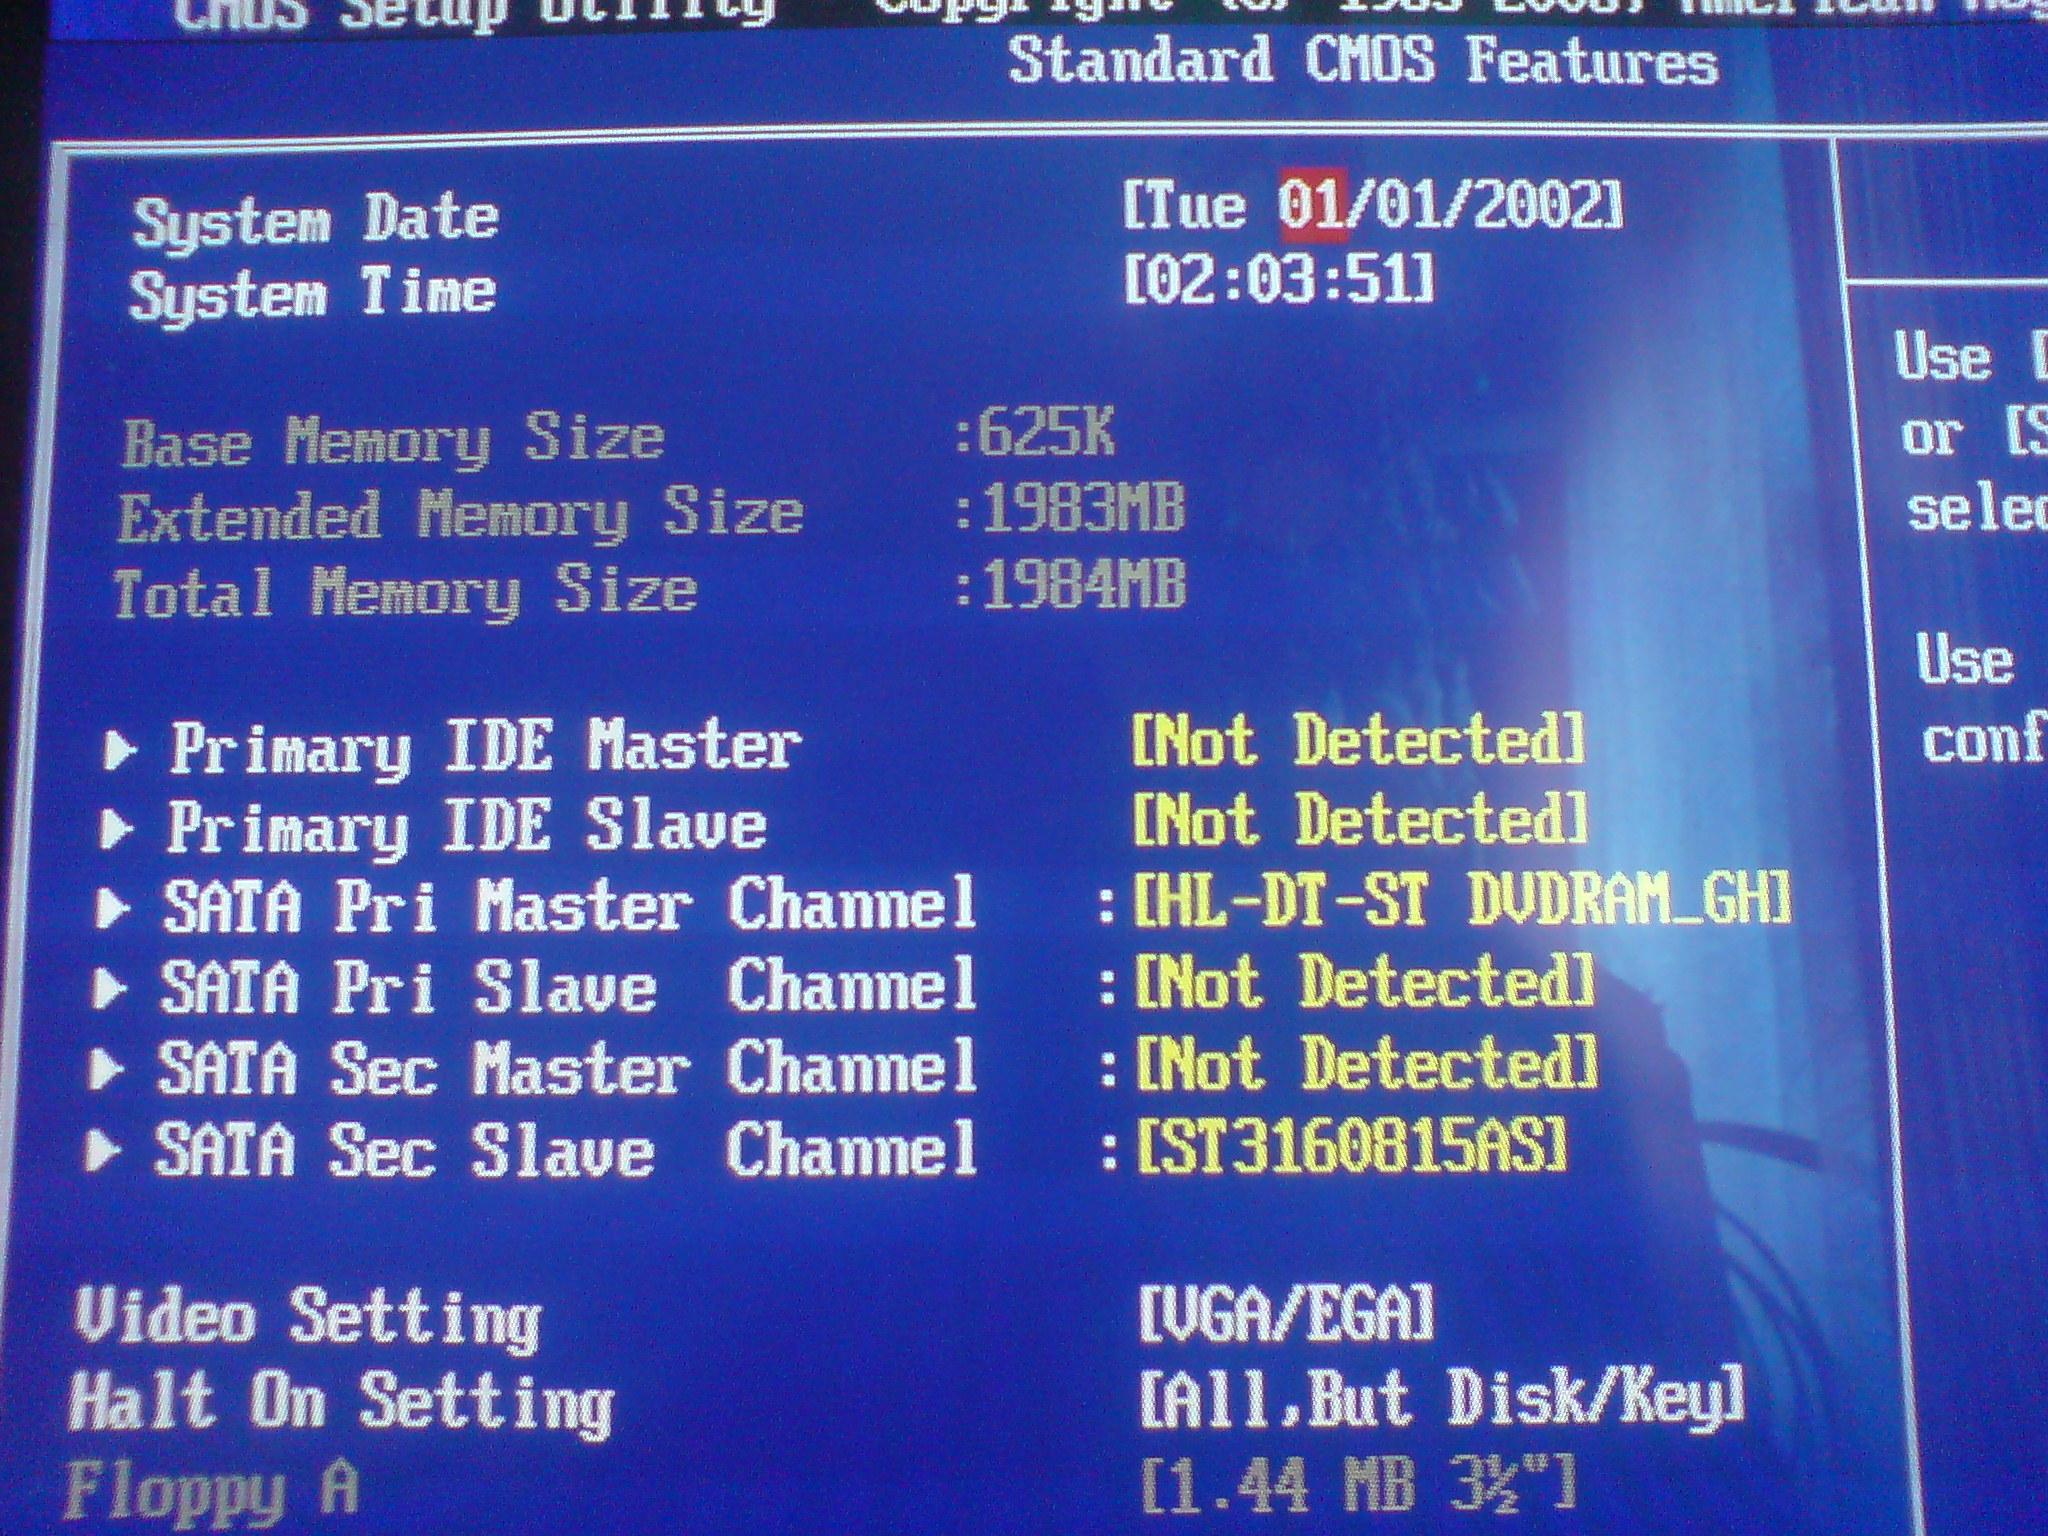 Acer Aspire M1640 - Bios - Brak opcji